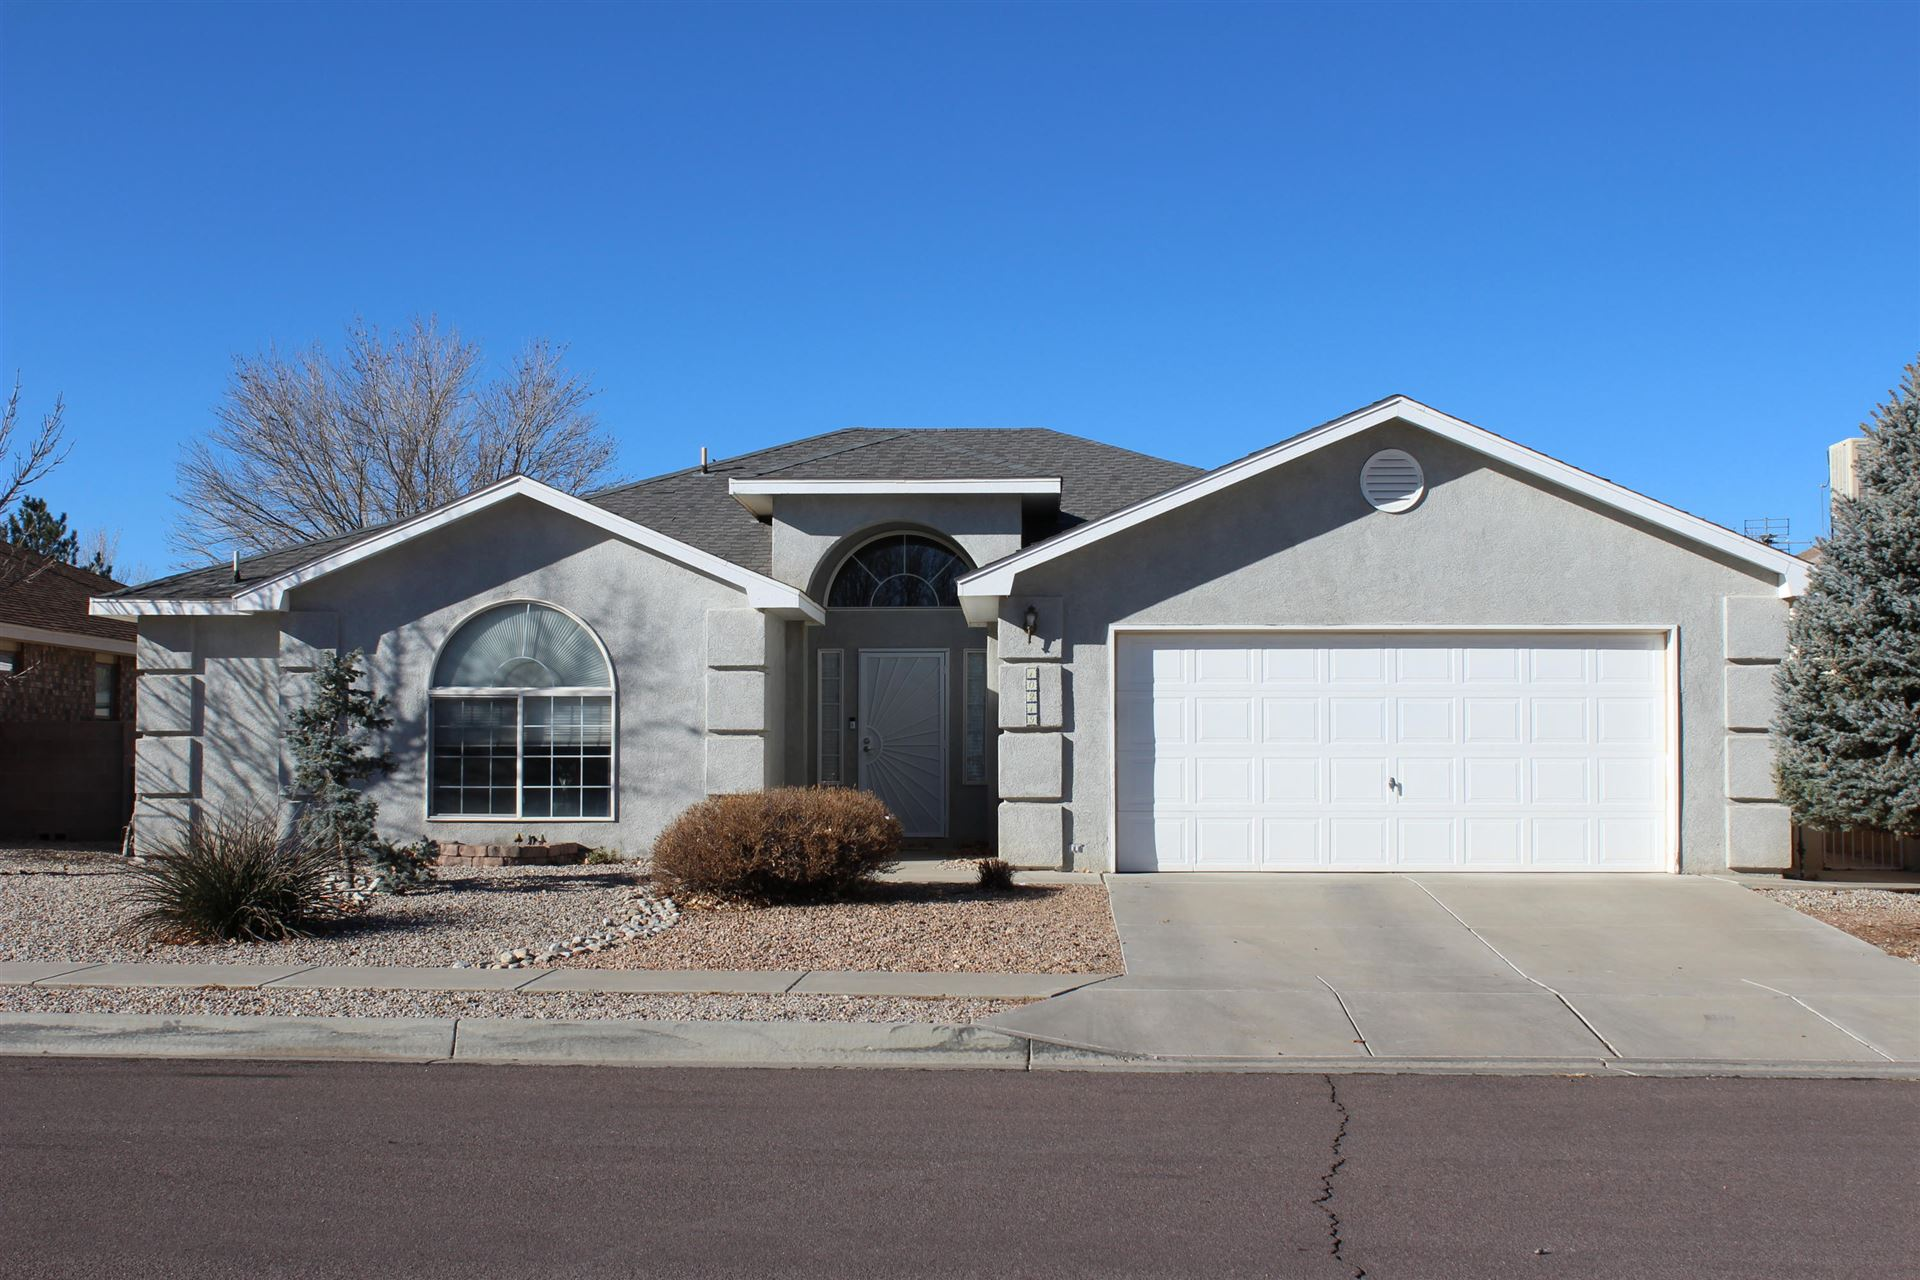 10219 MONTFORD Street NW, Albuquerque, NM 87114 - MLS#: 985747